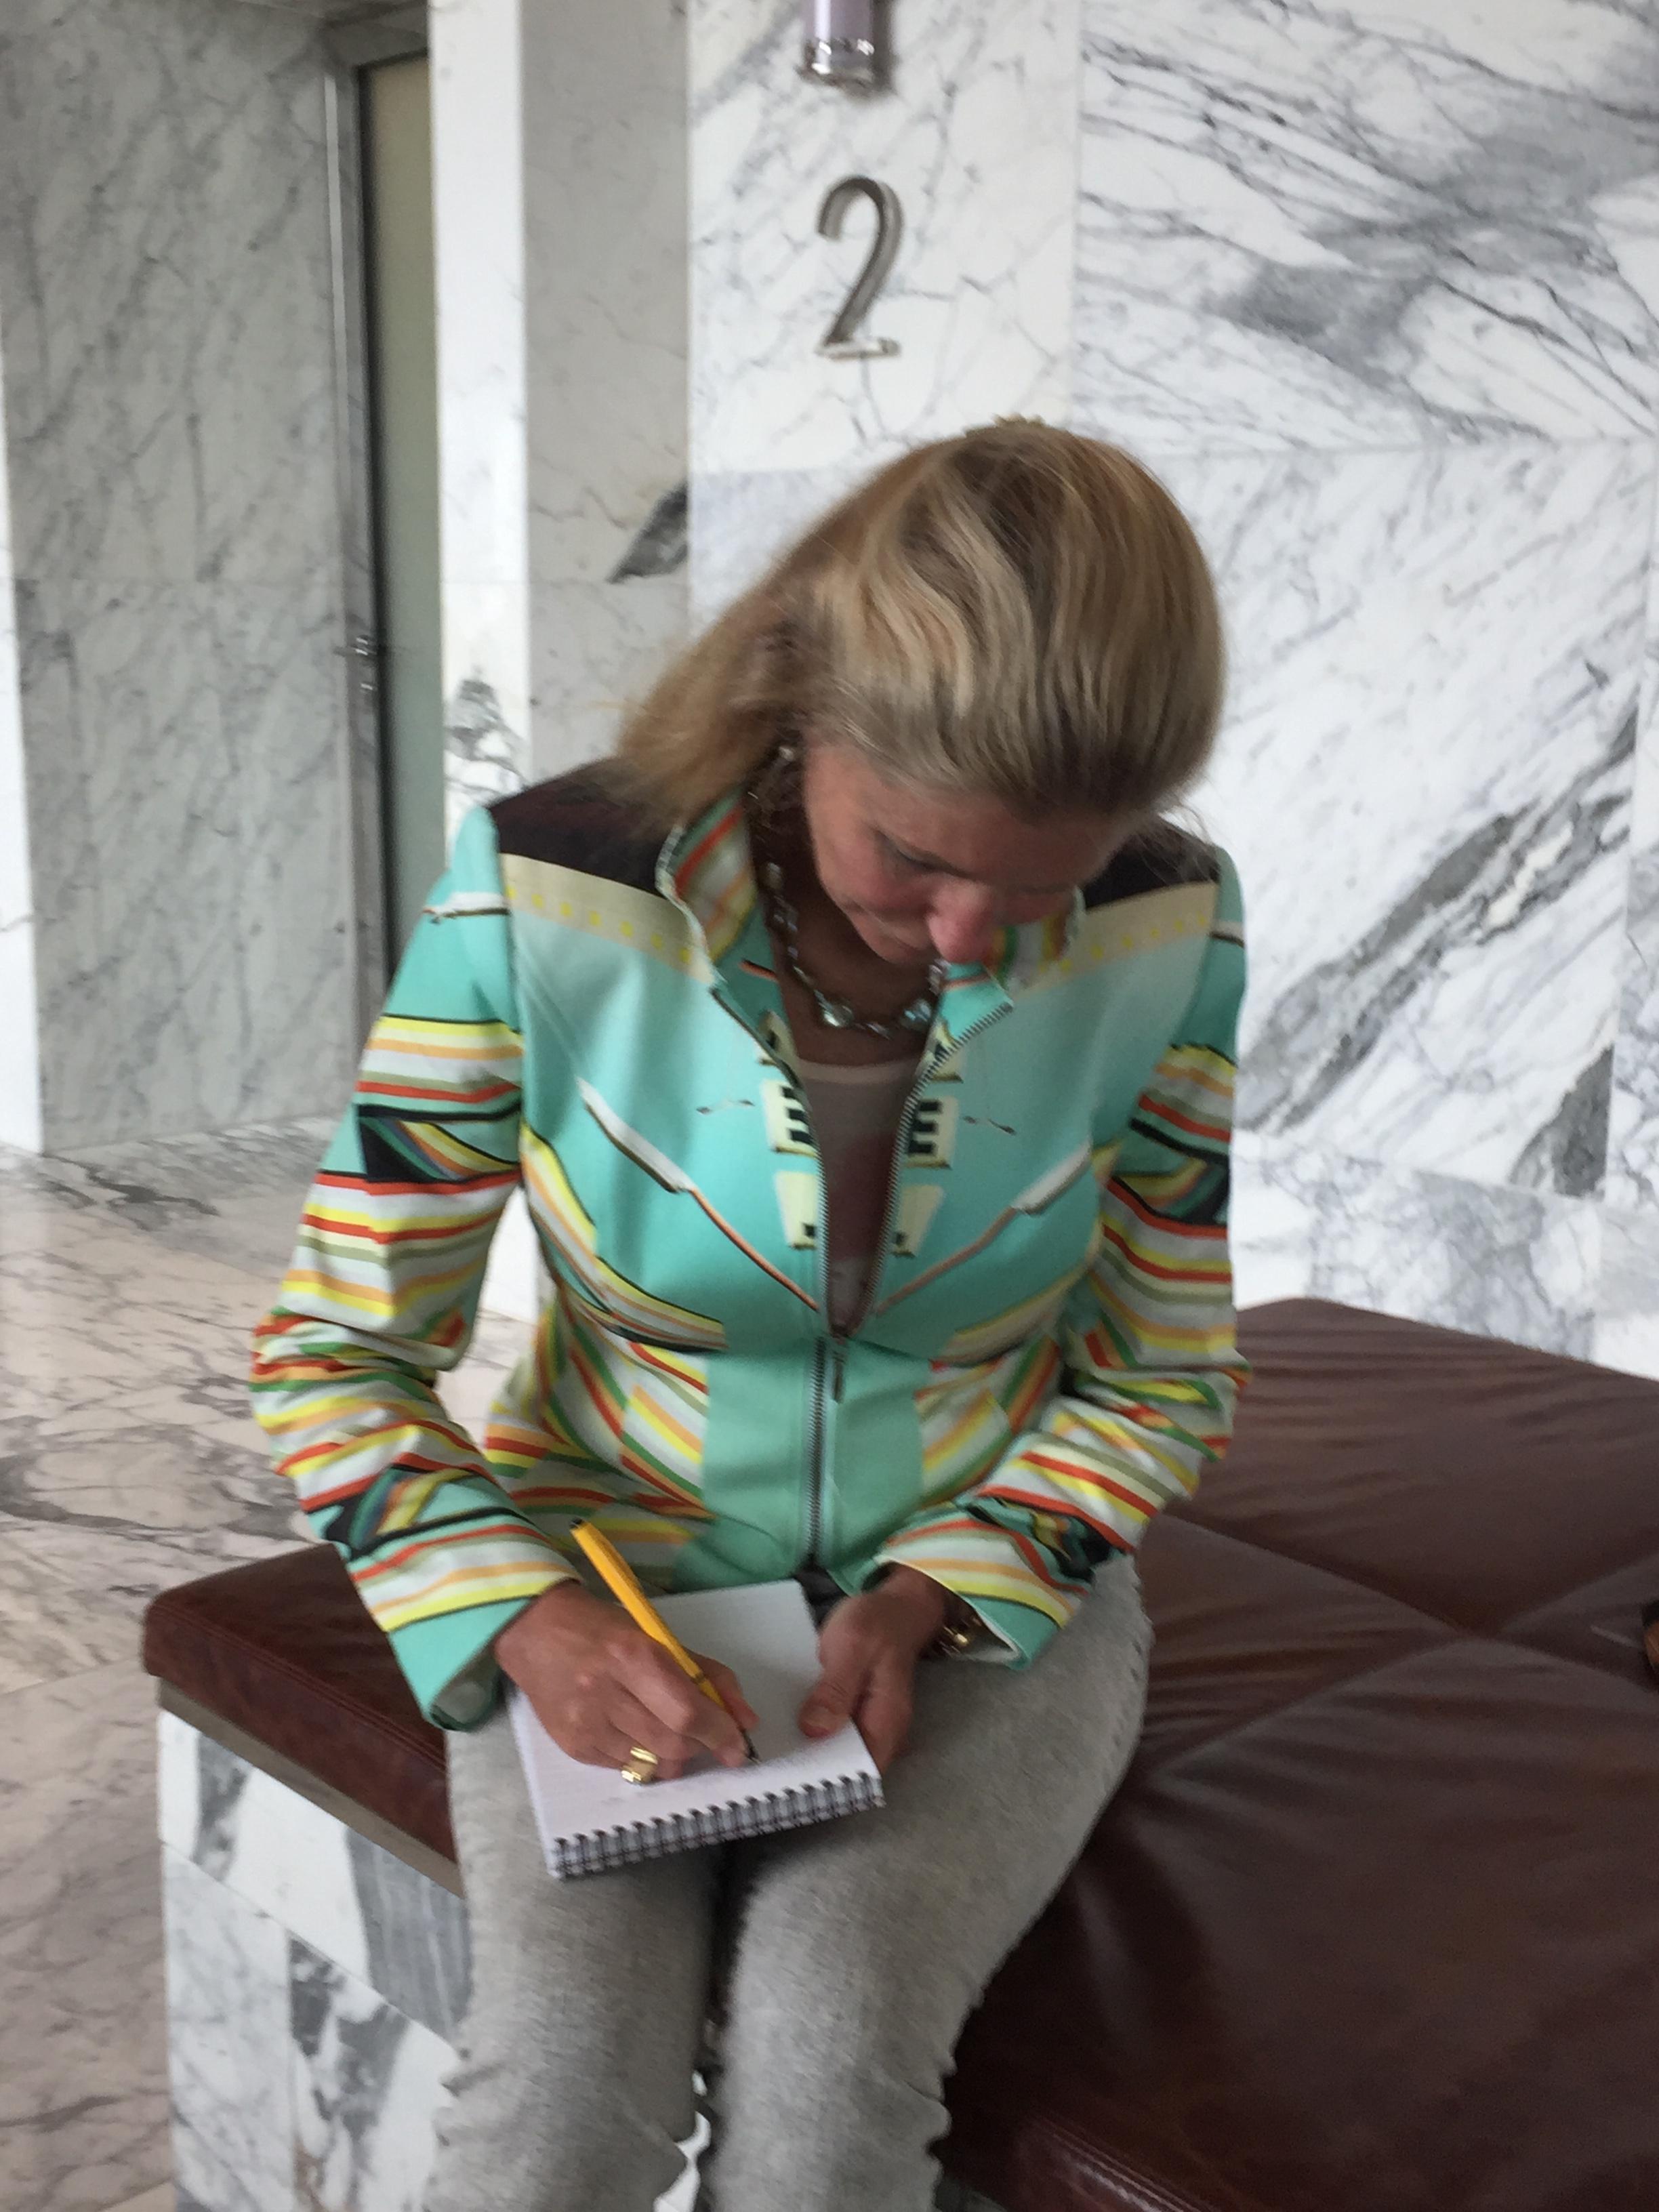 Bloemendaals raadslid Marielys Roos: 'Dit is een heksenjacht'